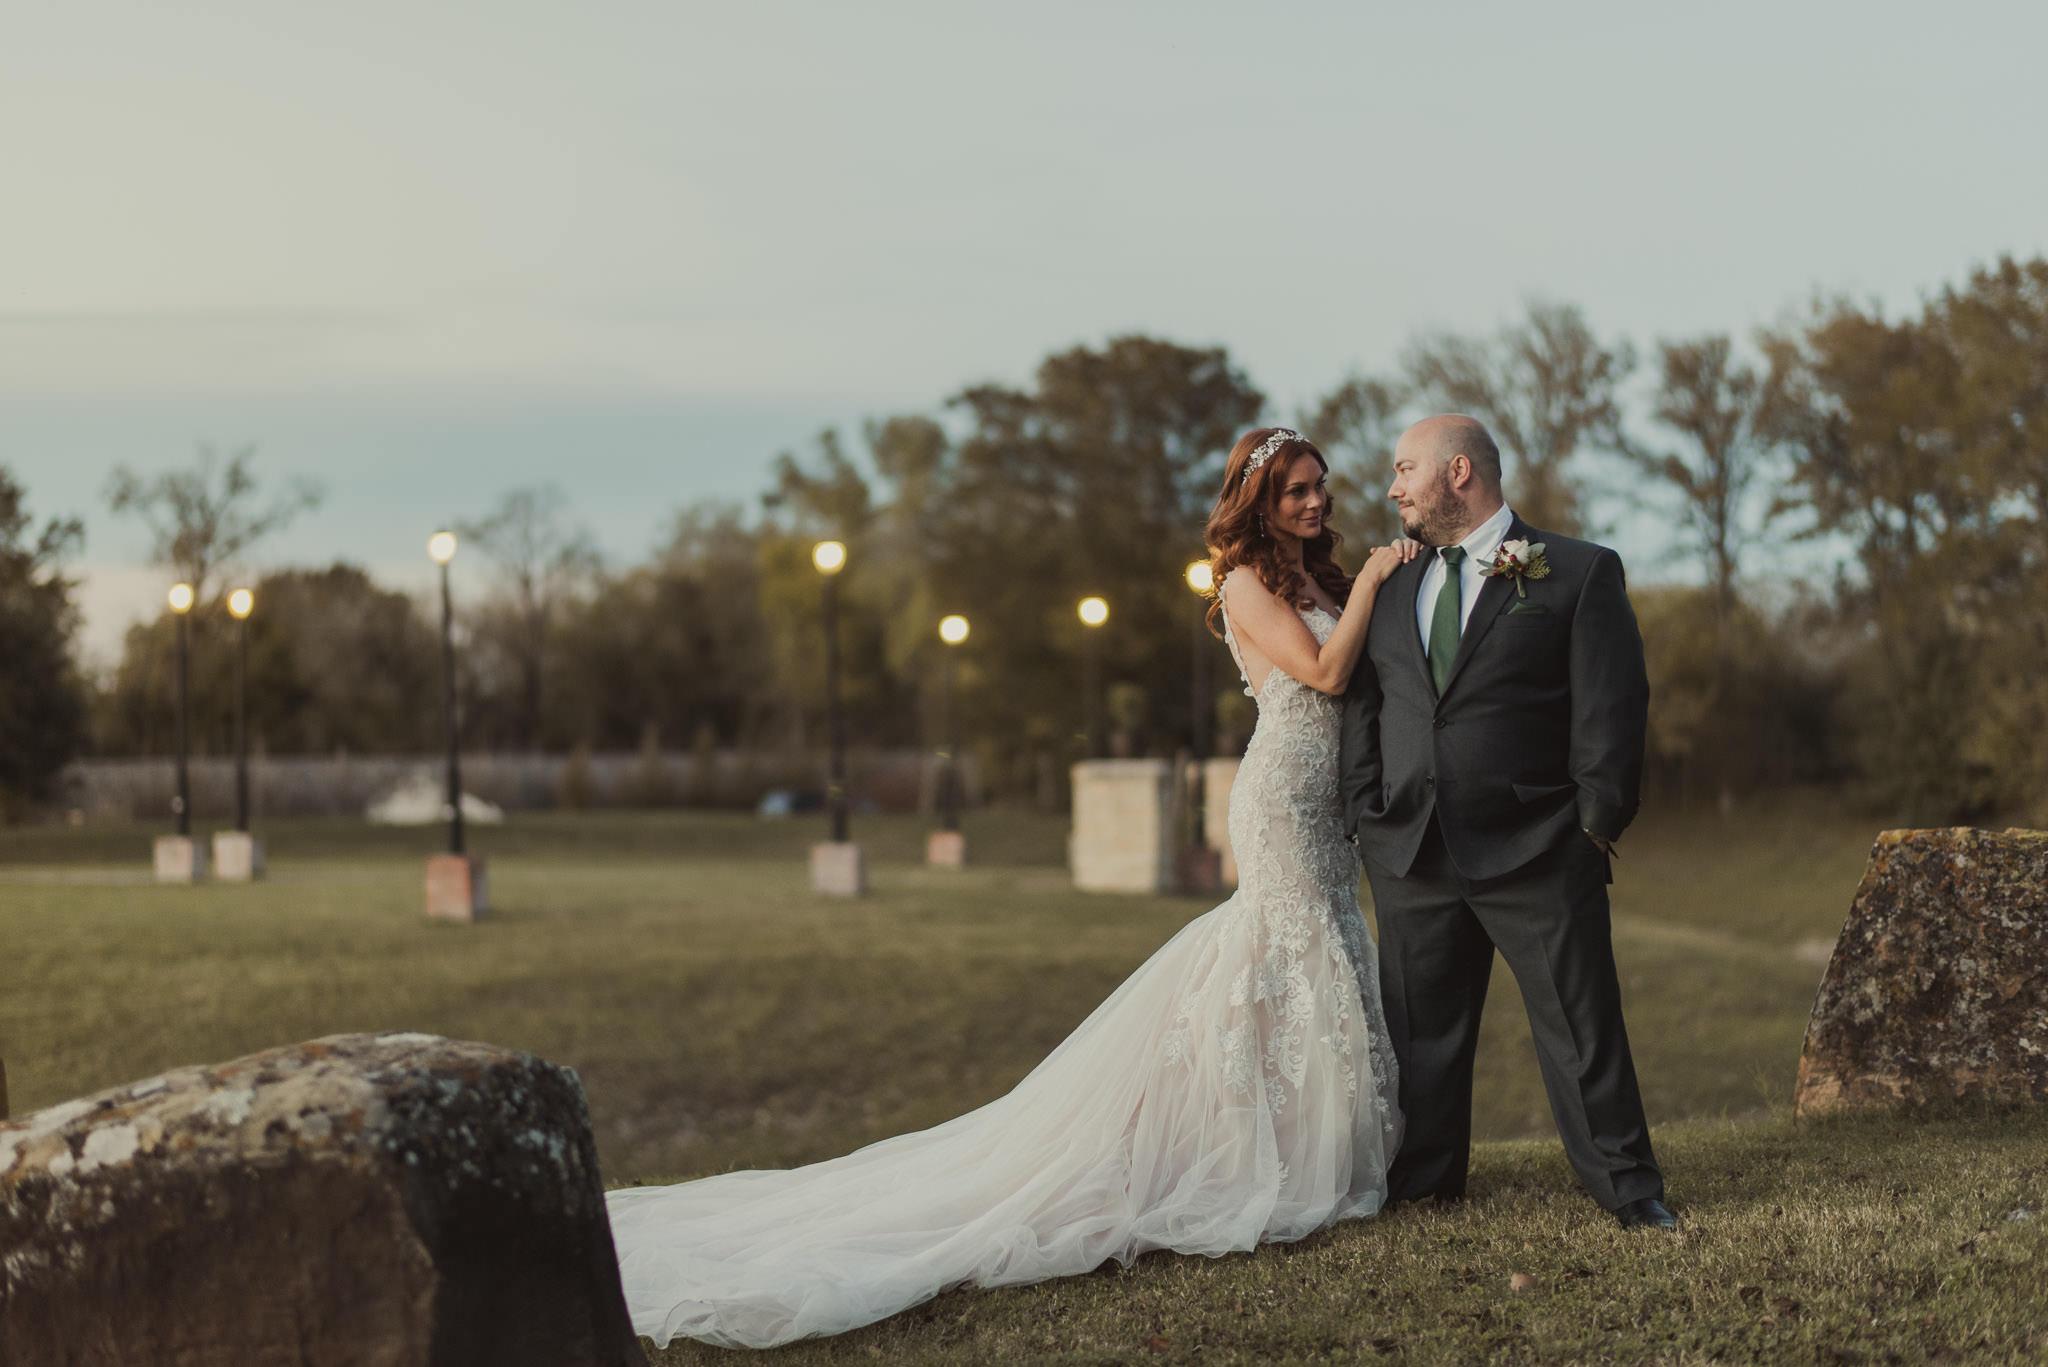 Cynthia-Curtis-Olde-Dobbine-Station-Houston-Wedding-Photographer-sm-86.jpg